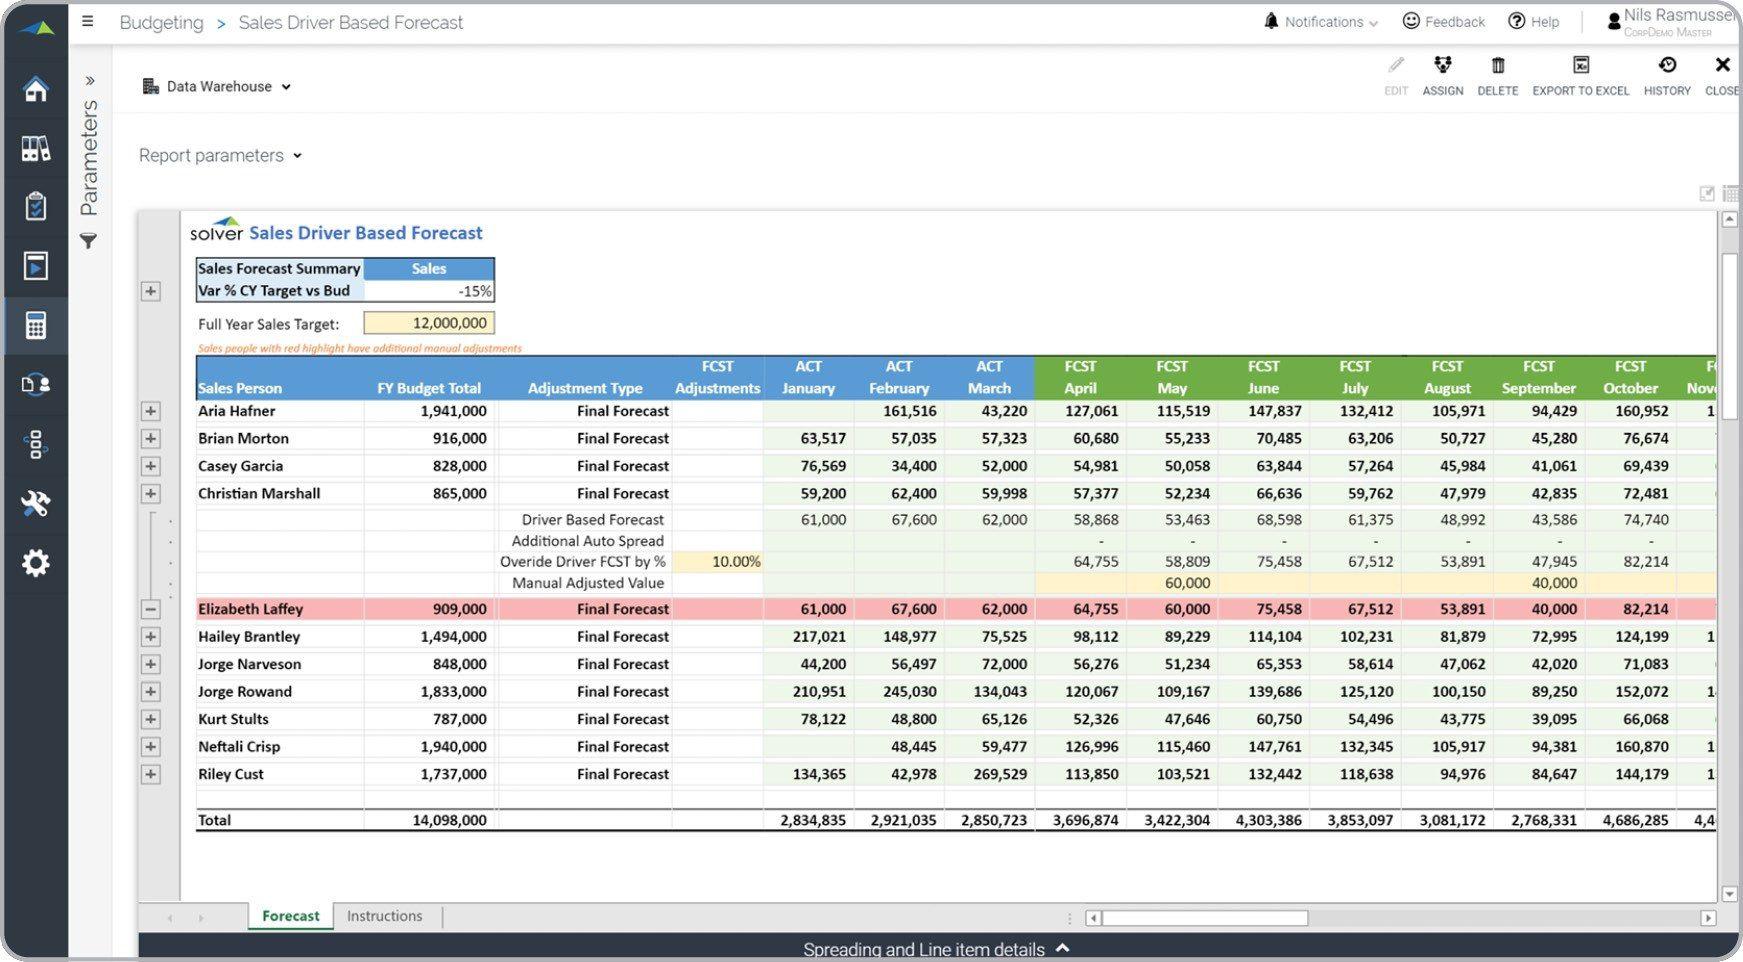 004 Impressive Sample Line Item Budget Format Picture Full